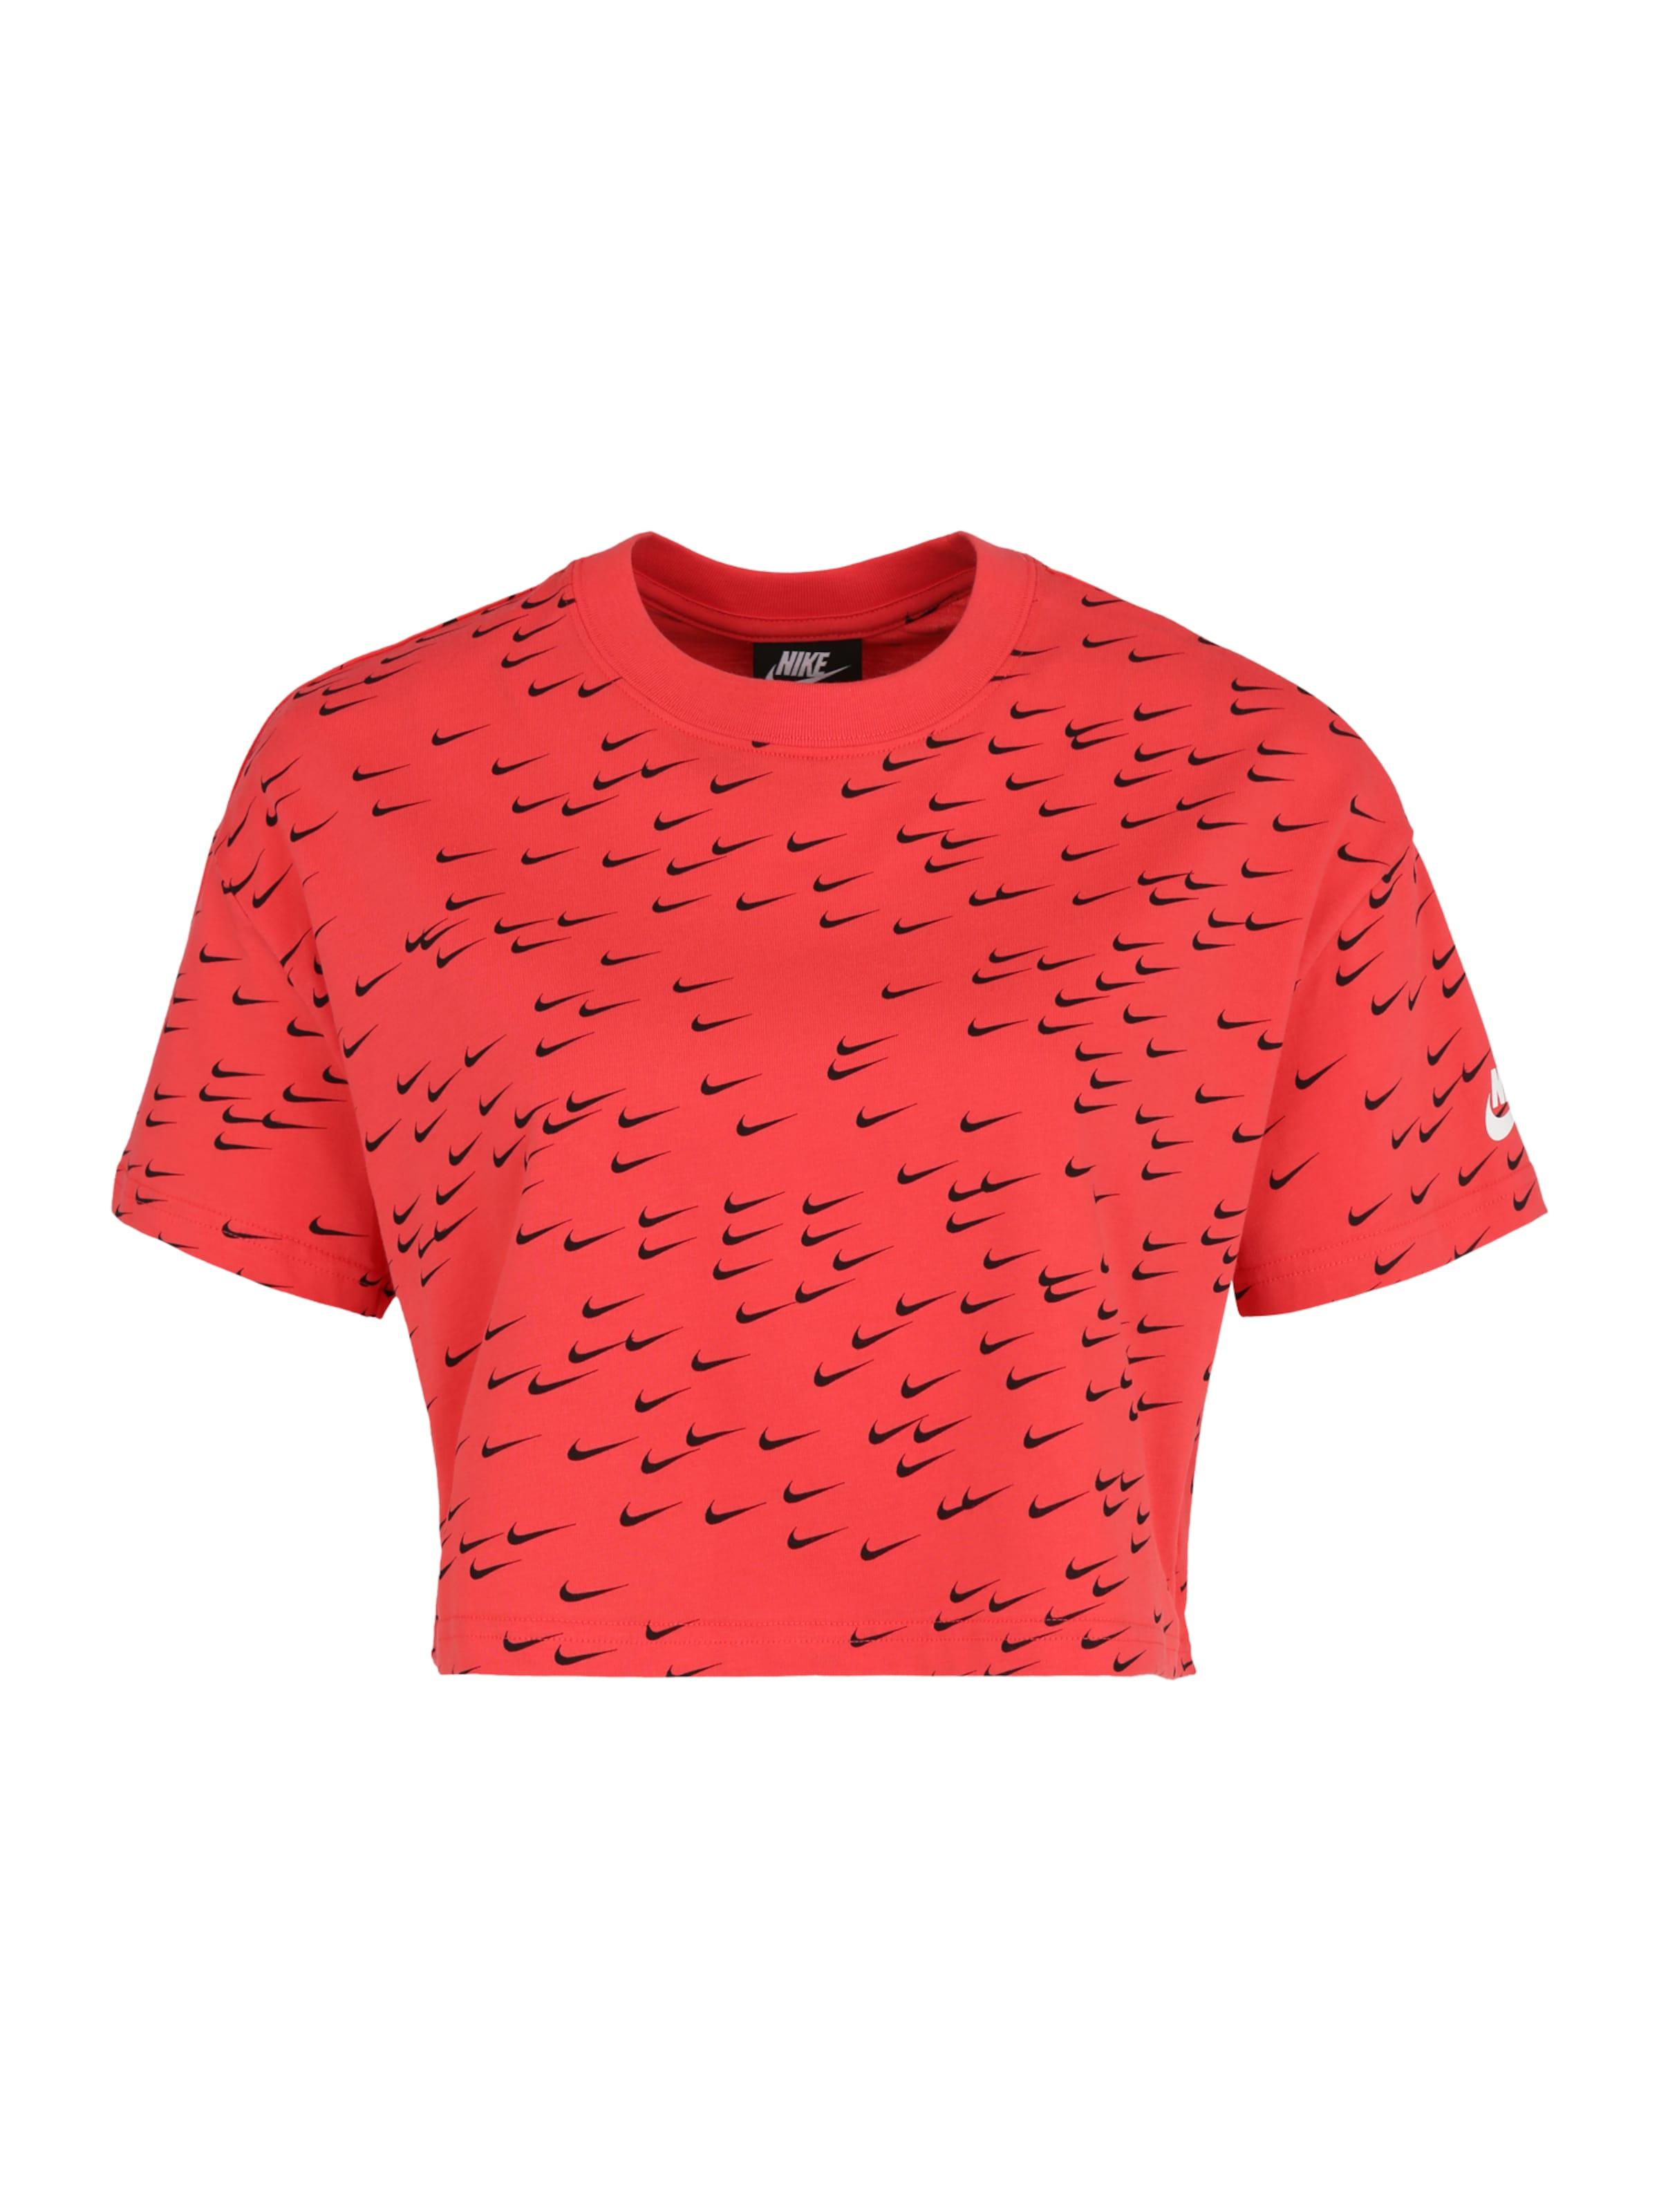 En RougeNoir Nike T 'essntl' Sportswear shirt qGMjSVULzp